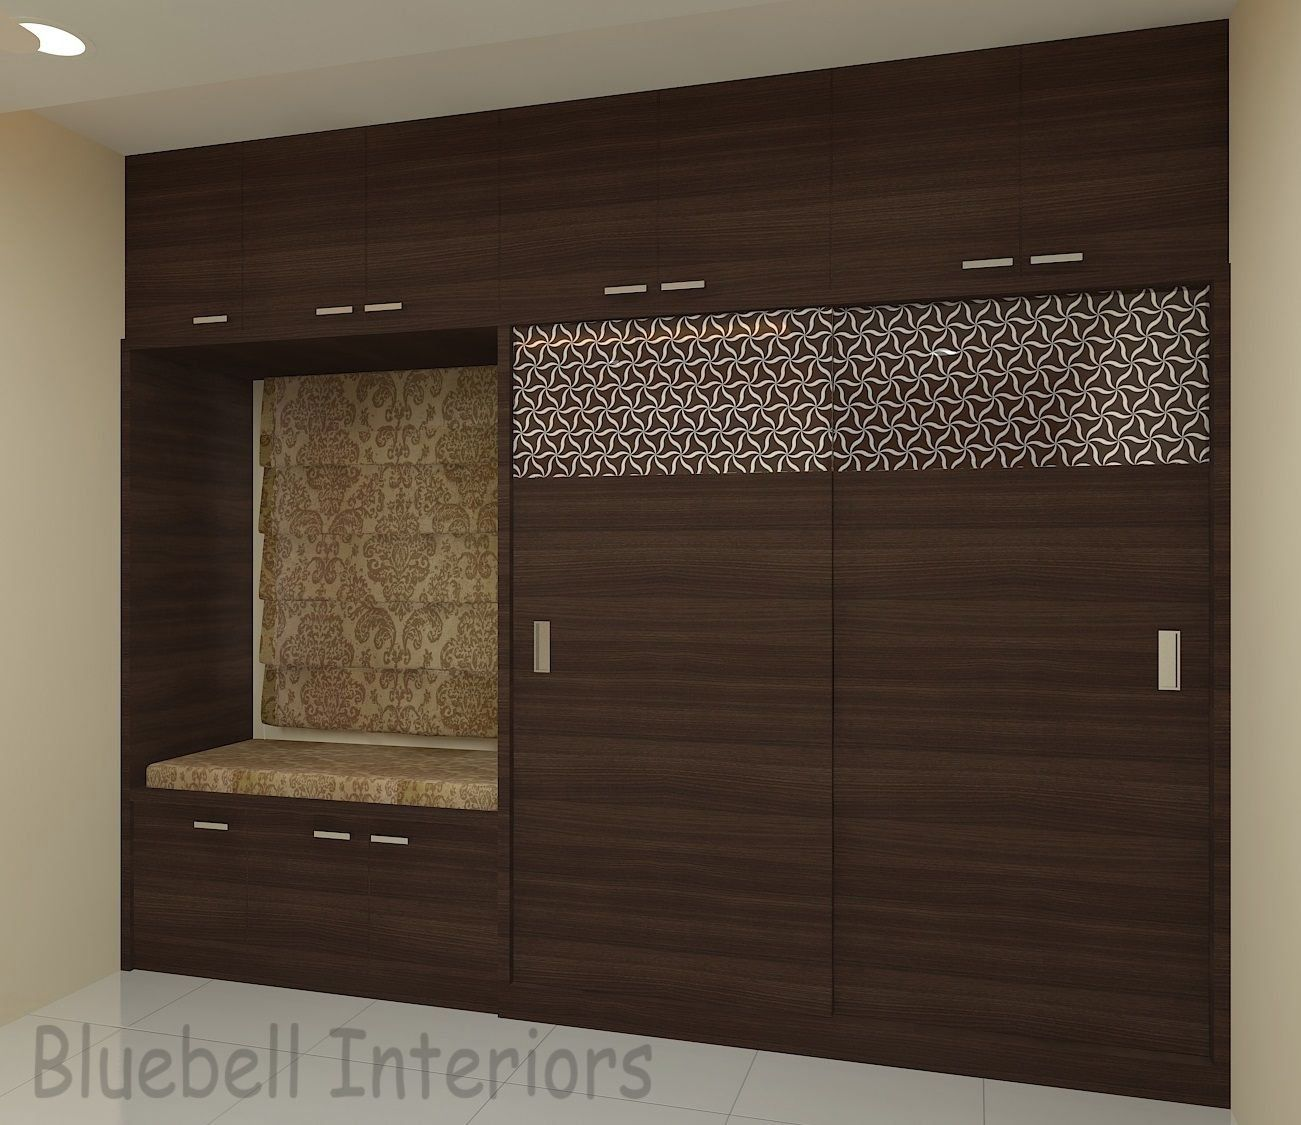 Wardrobe With Window Settee Glass Design On Wardrobe Shutter Brown Wardrobe 1000 In 2020 Bedroom Closet Design Bedroom Furniture Design Bedroom Door Design